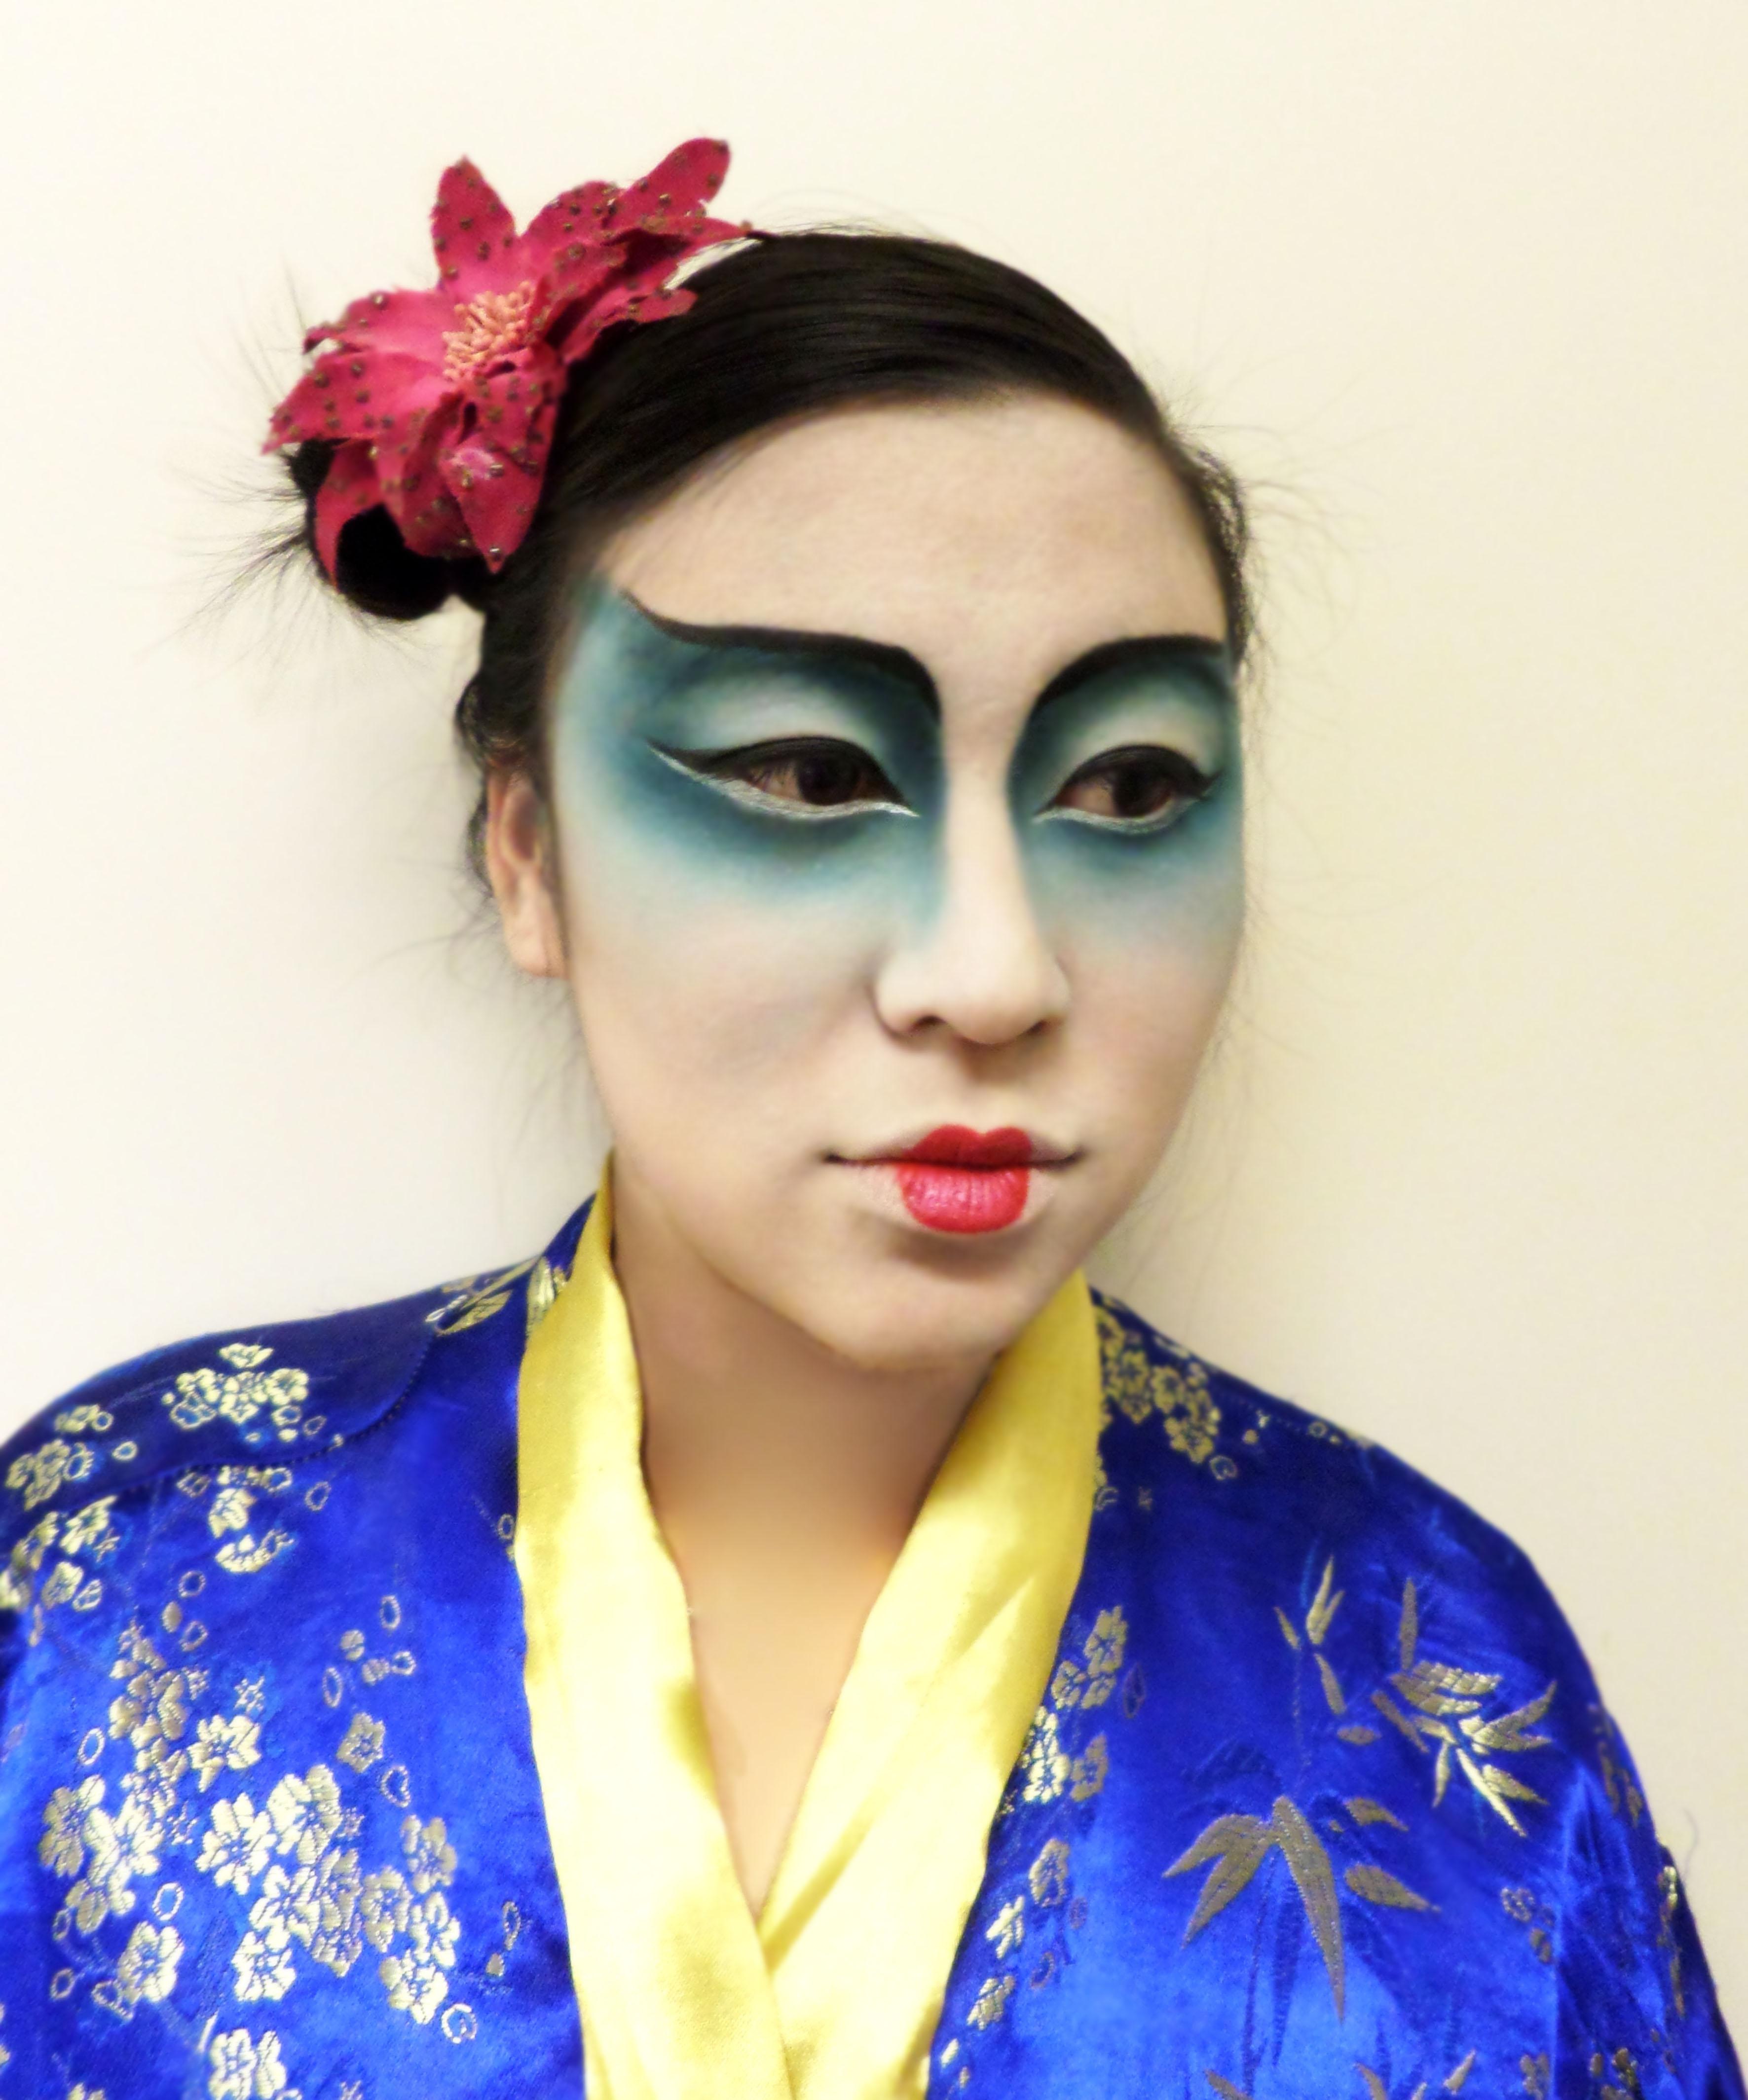 magdalena madraszewska - make up artist